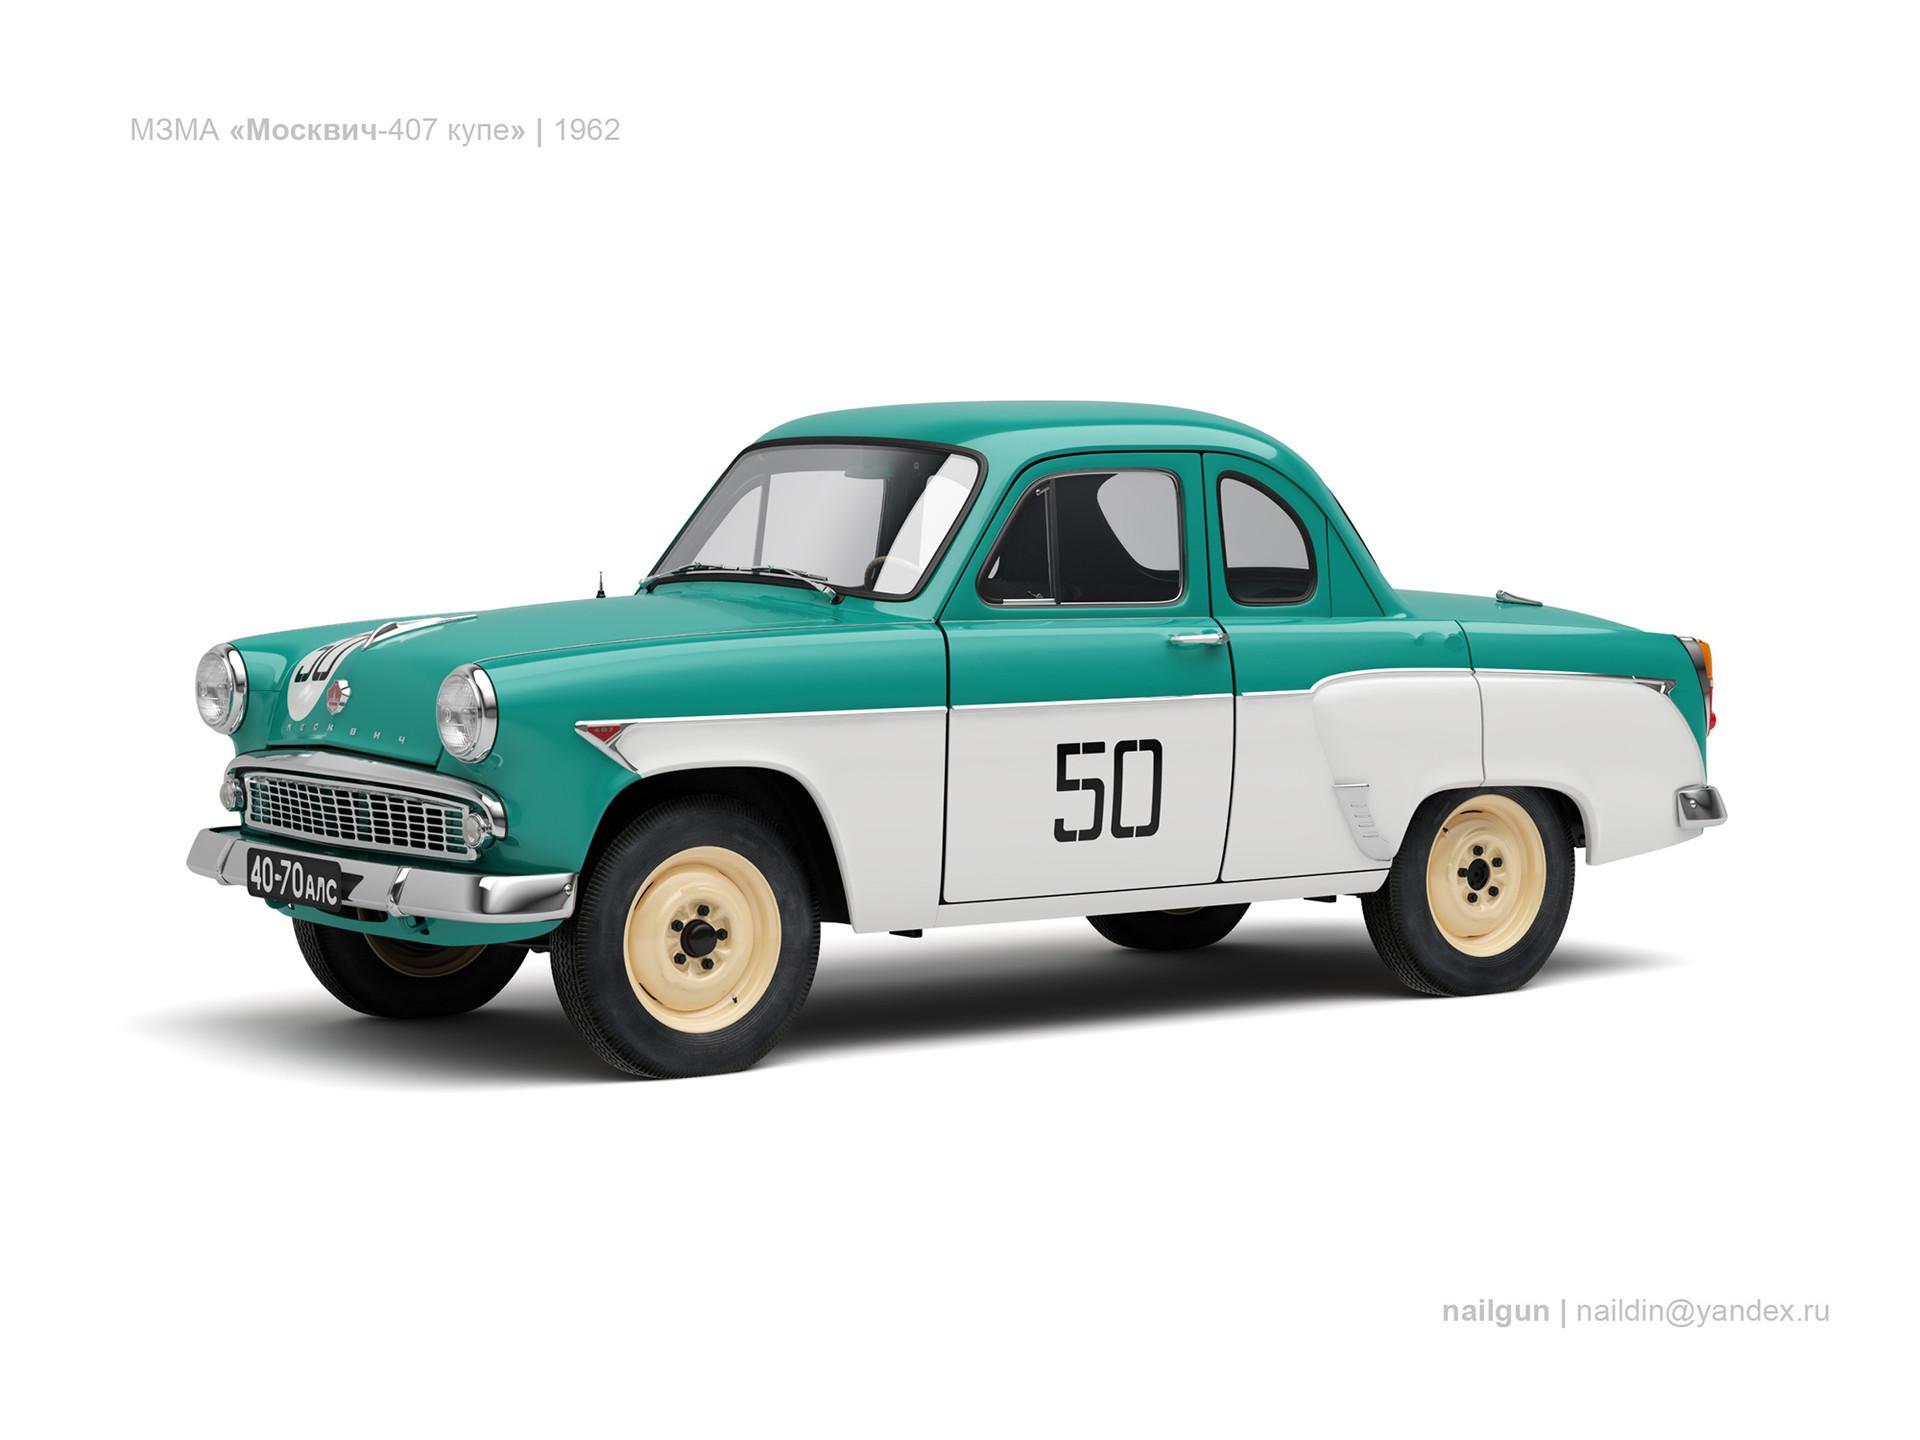 Nail khusnutdinov ussr moskvich 407 coupe 1962 0